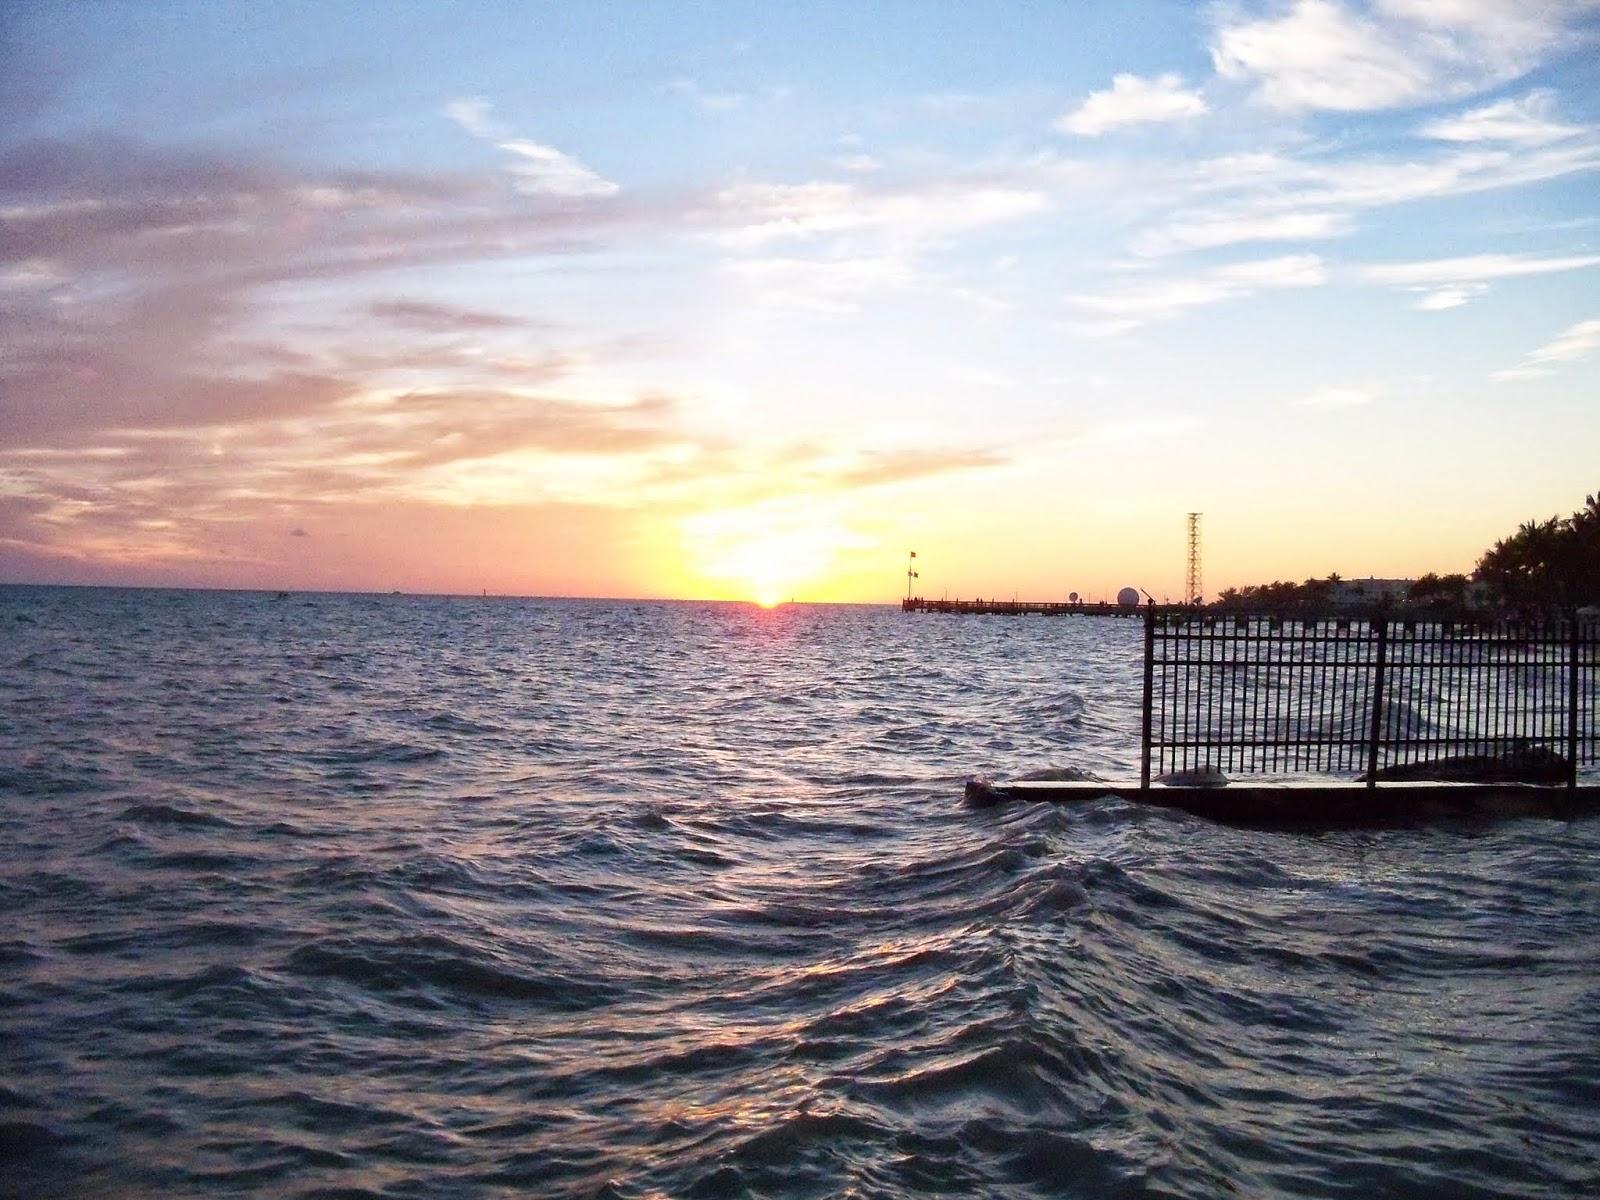 Key West Vacation - 116_5606.JPG